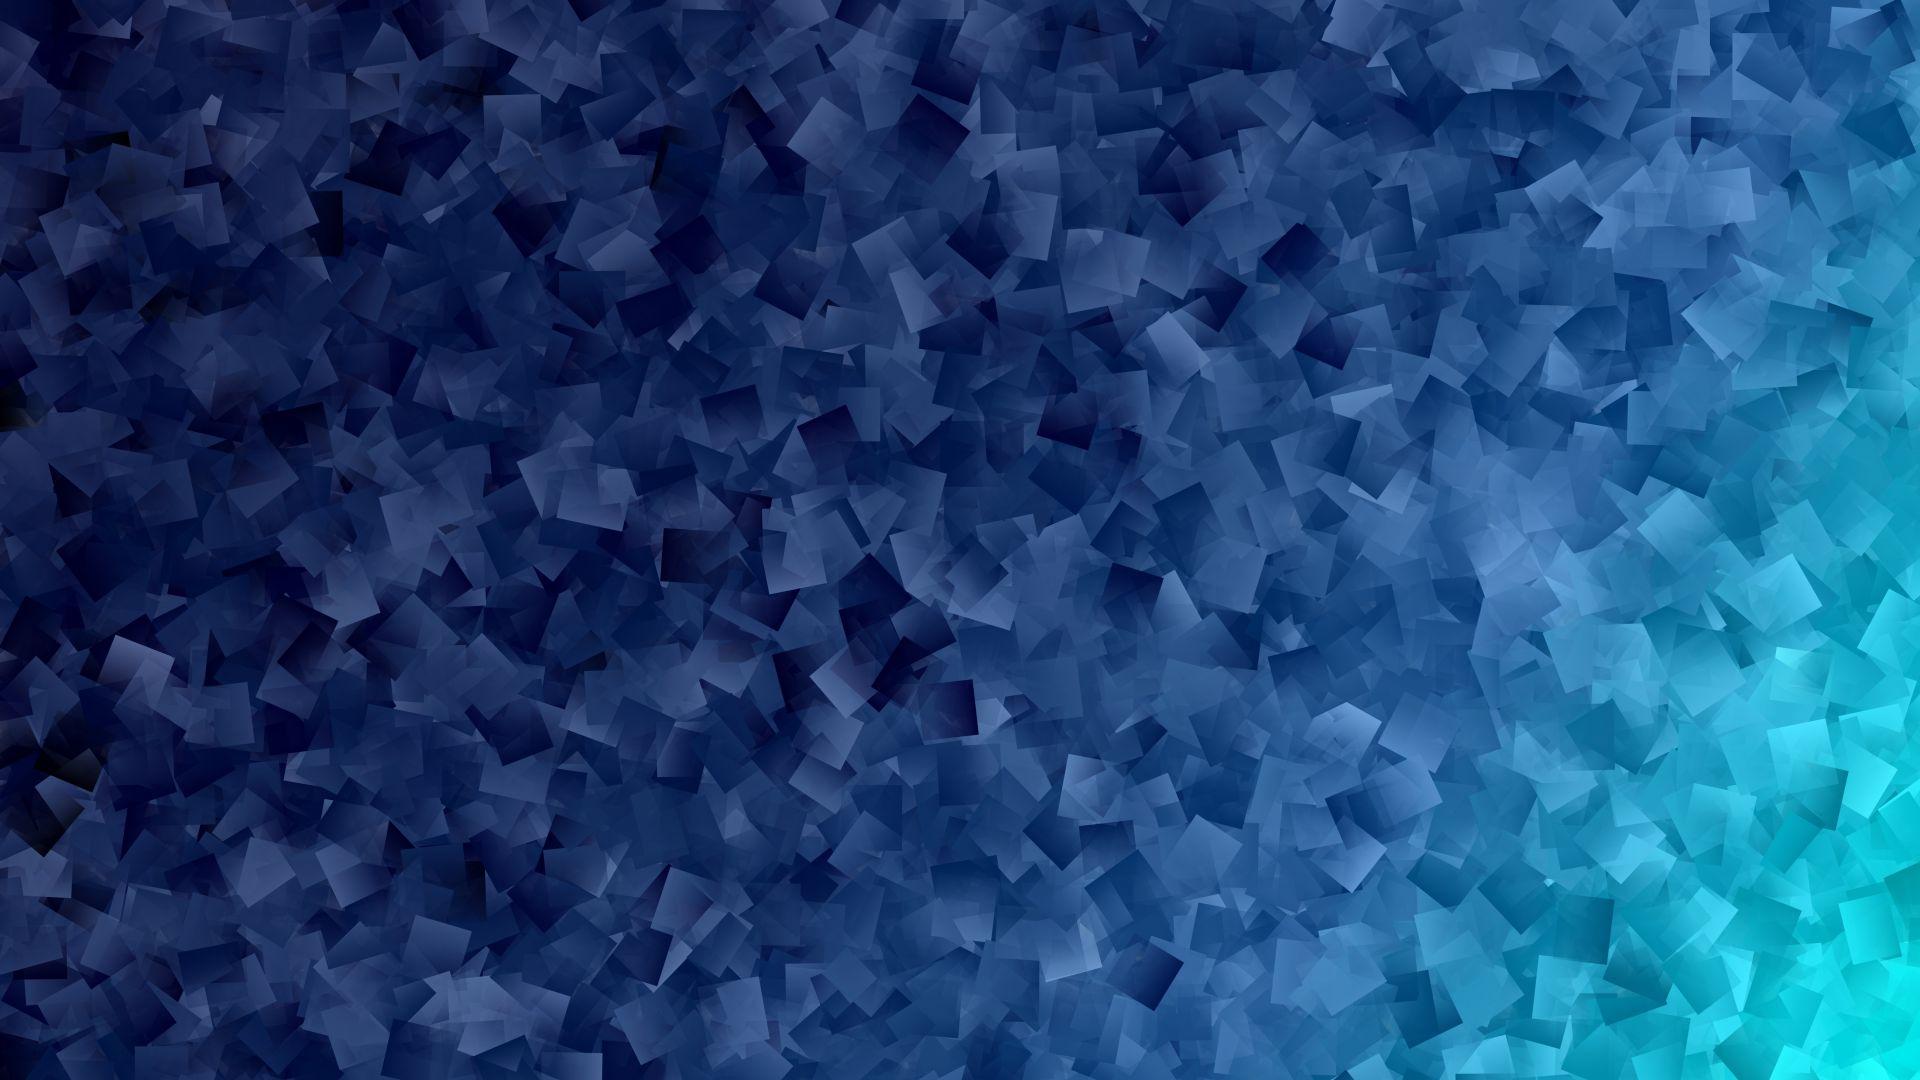 Wallpaper Abstract, blue patterns, design